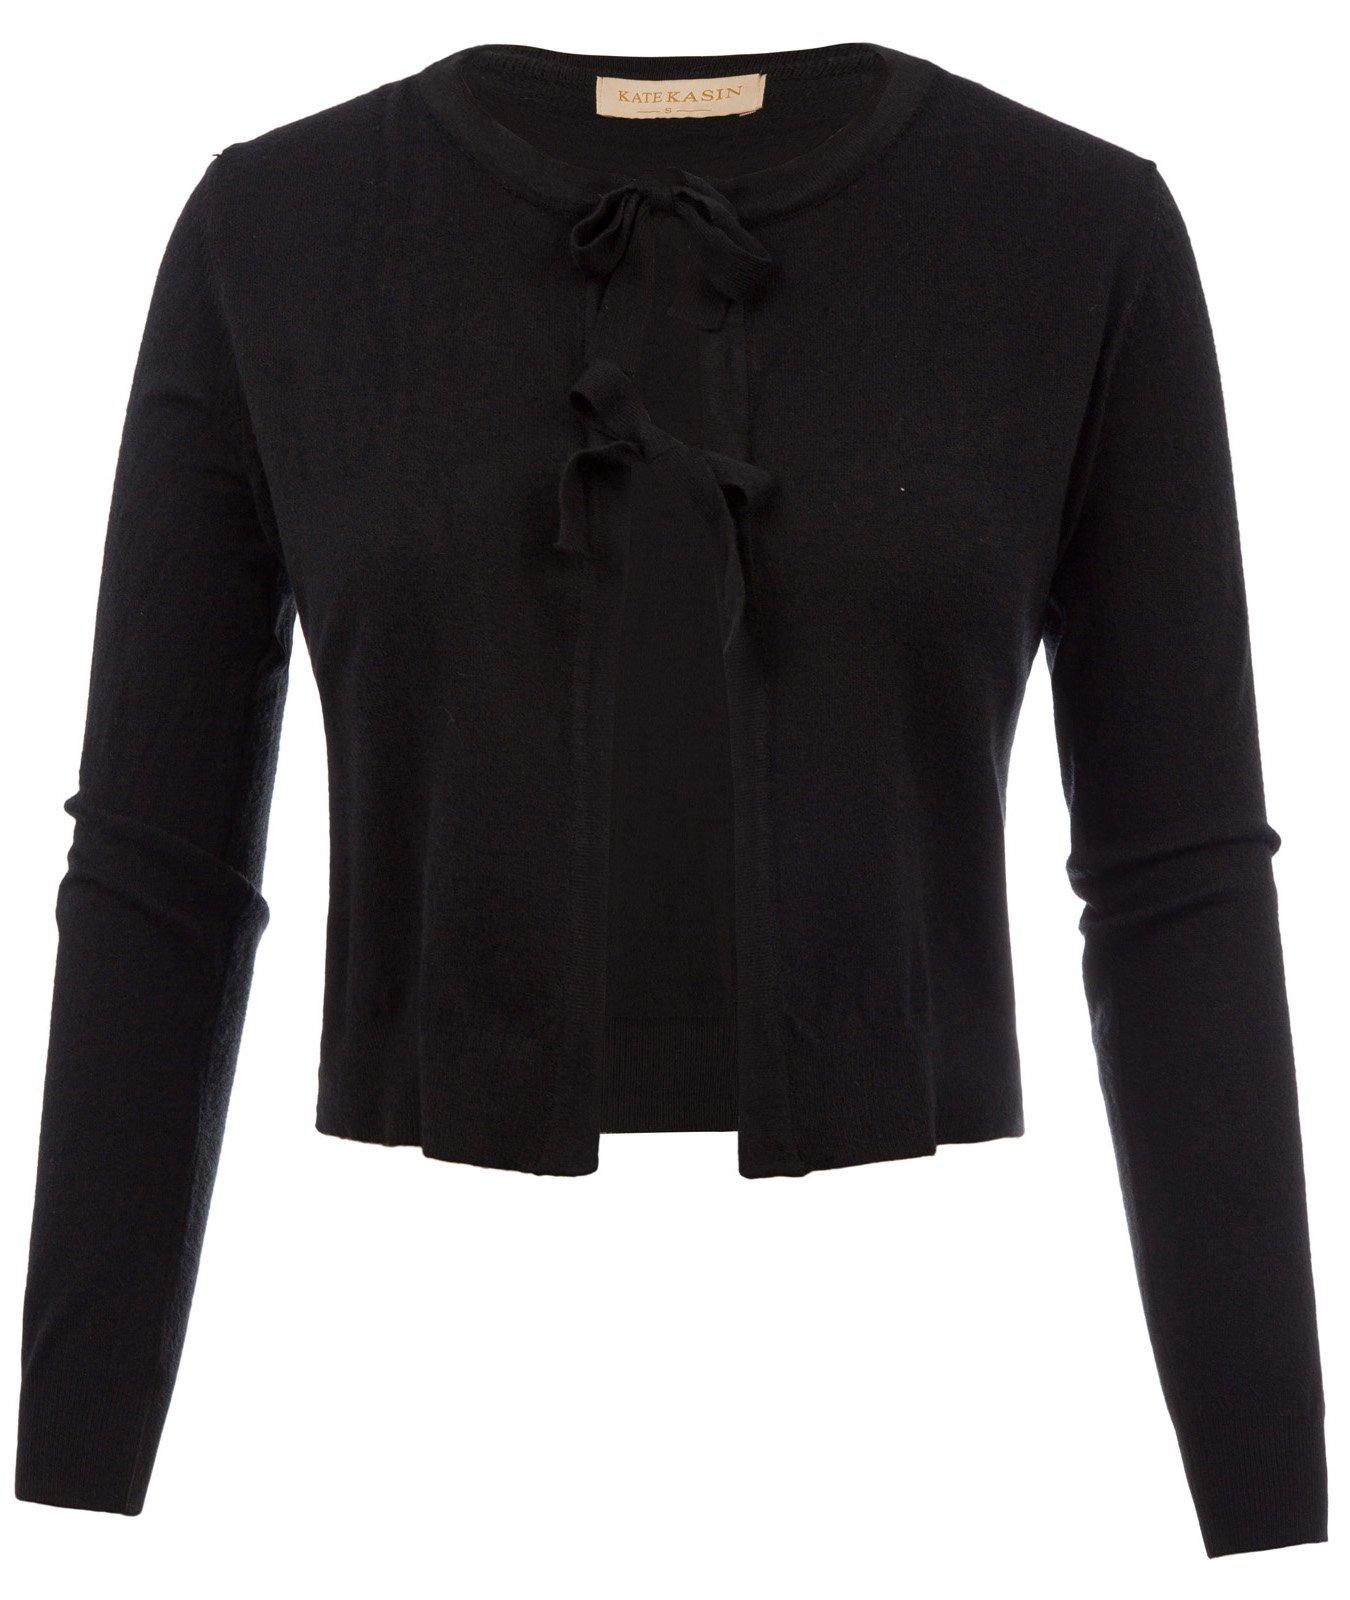 Kate Kasin Women's Cropped Knit Cardigan Self-Tie Bow-Knot Shrug Black,M